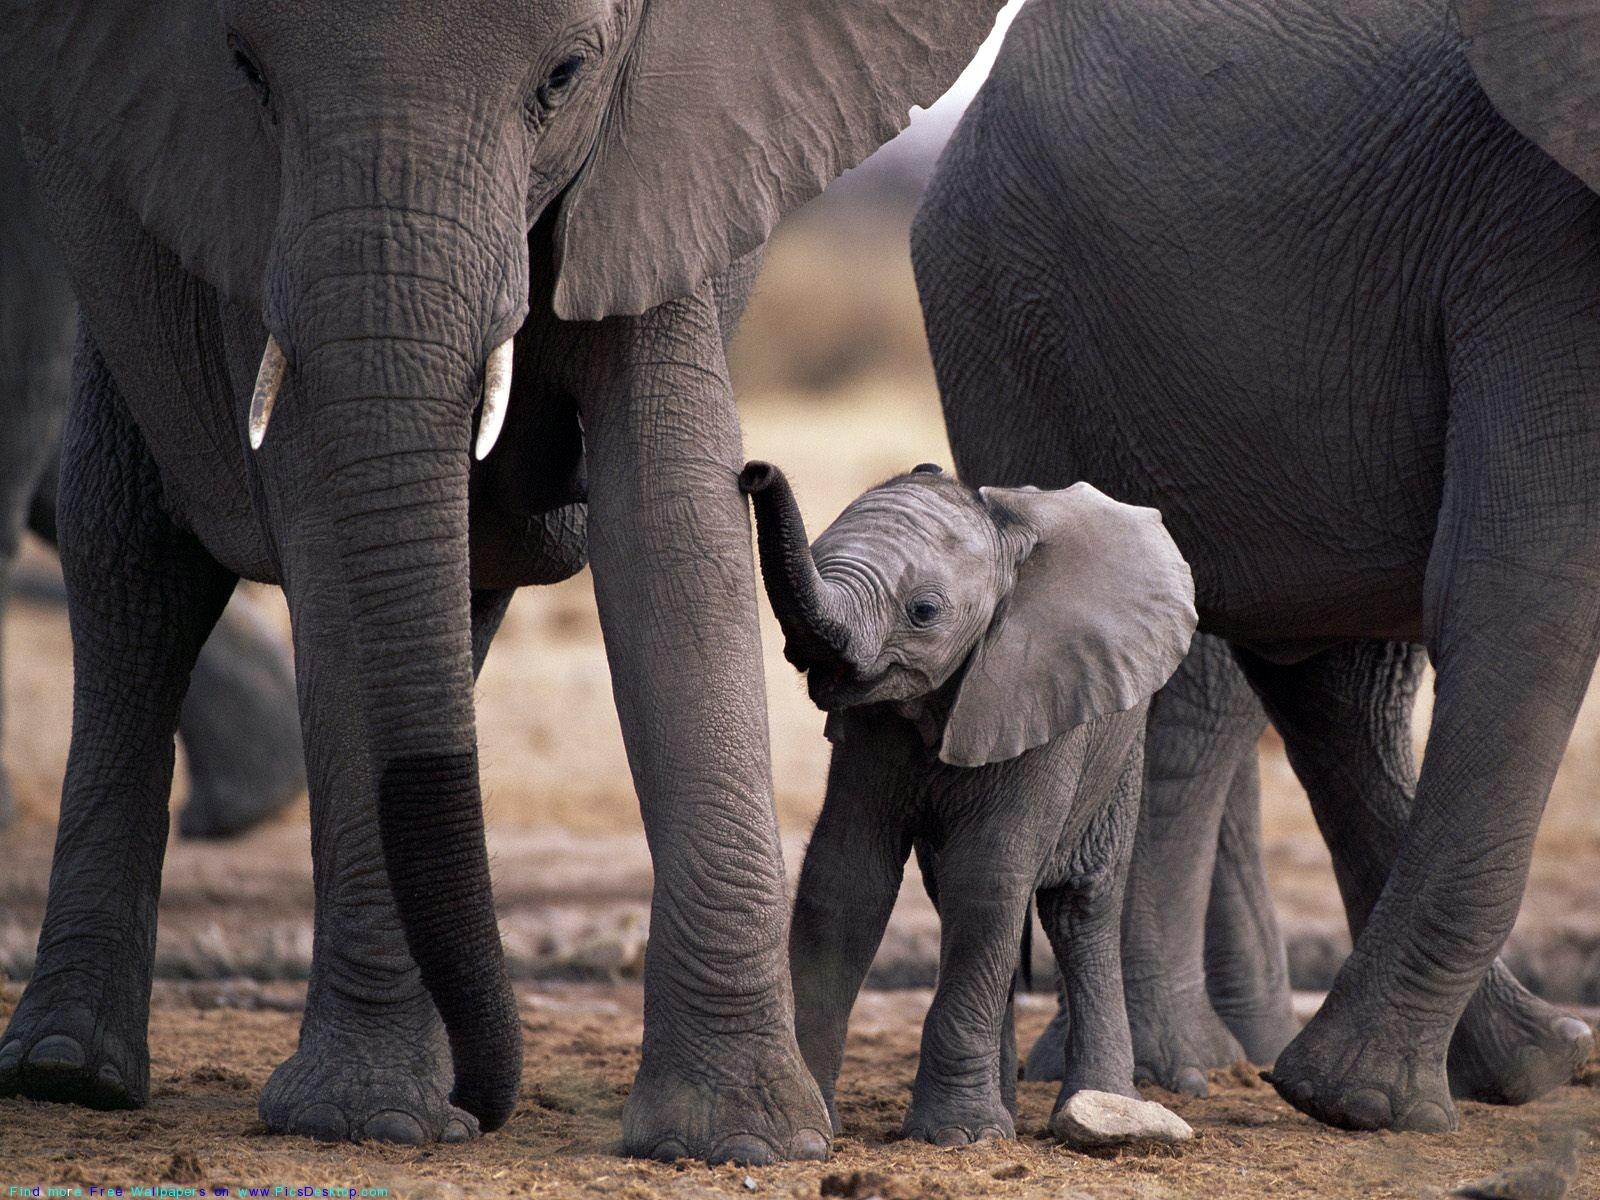 Elephants Animal Animals Calf: The Big African Elephants With Cute Elephant-calf